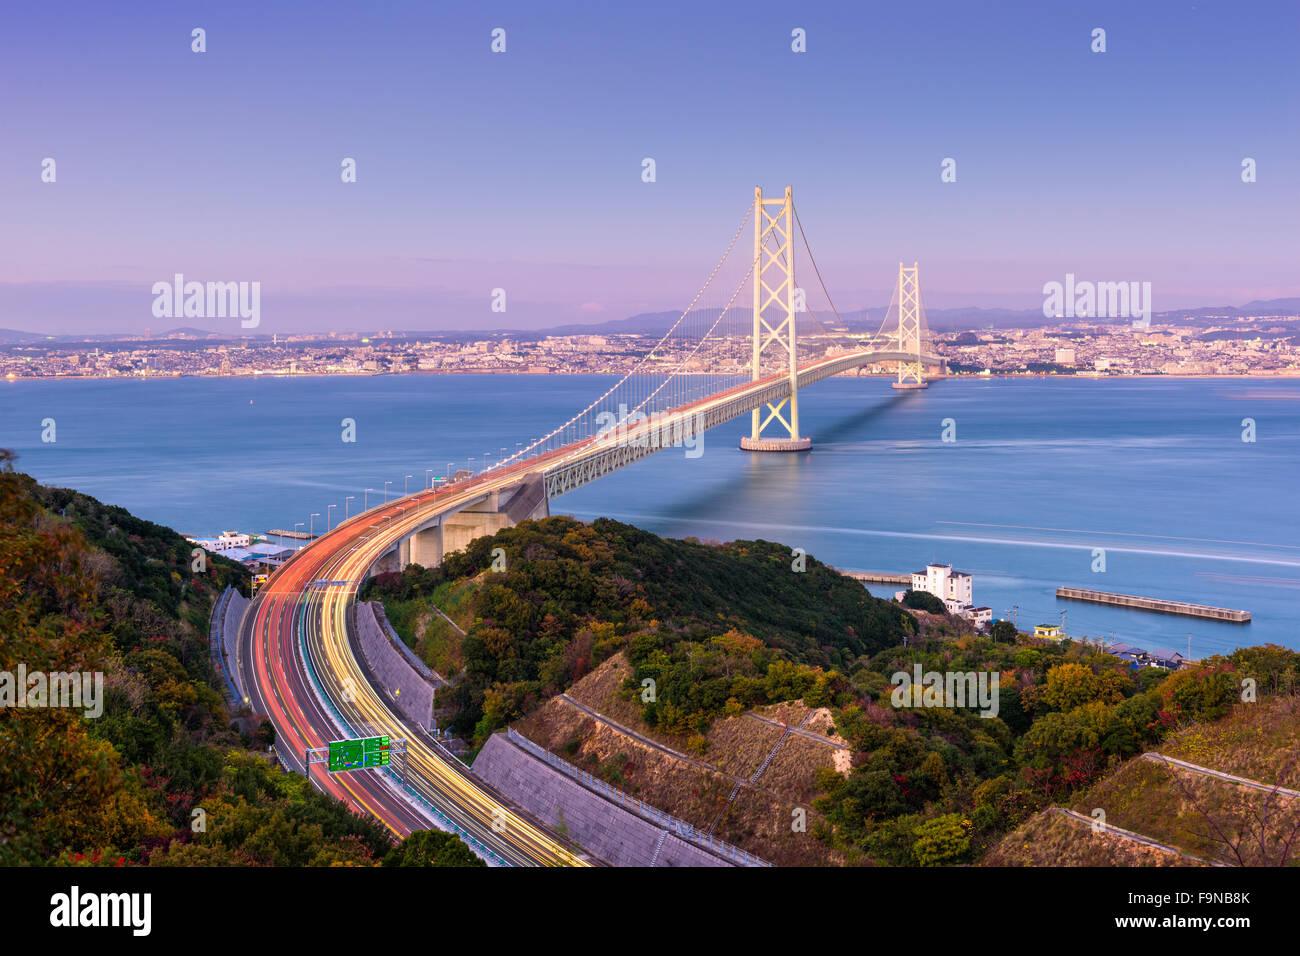 Akashi Kaikyo Bridge spanning the Seto Inland Sea from Kobe, Japan. Stock Photo